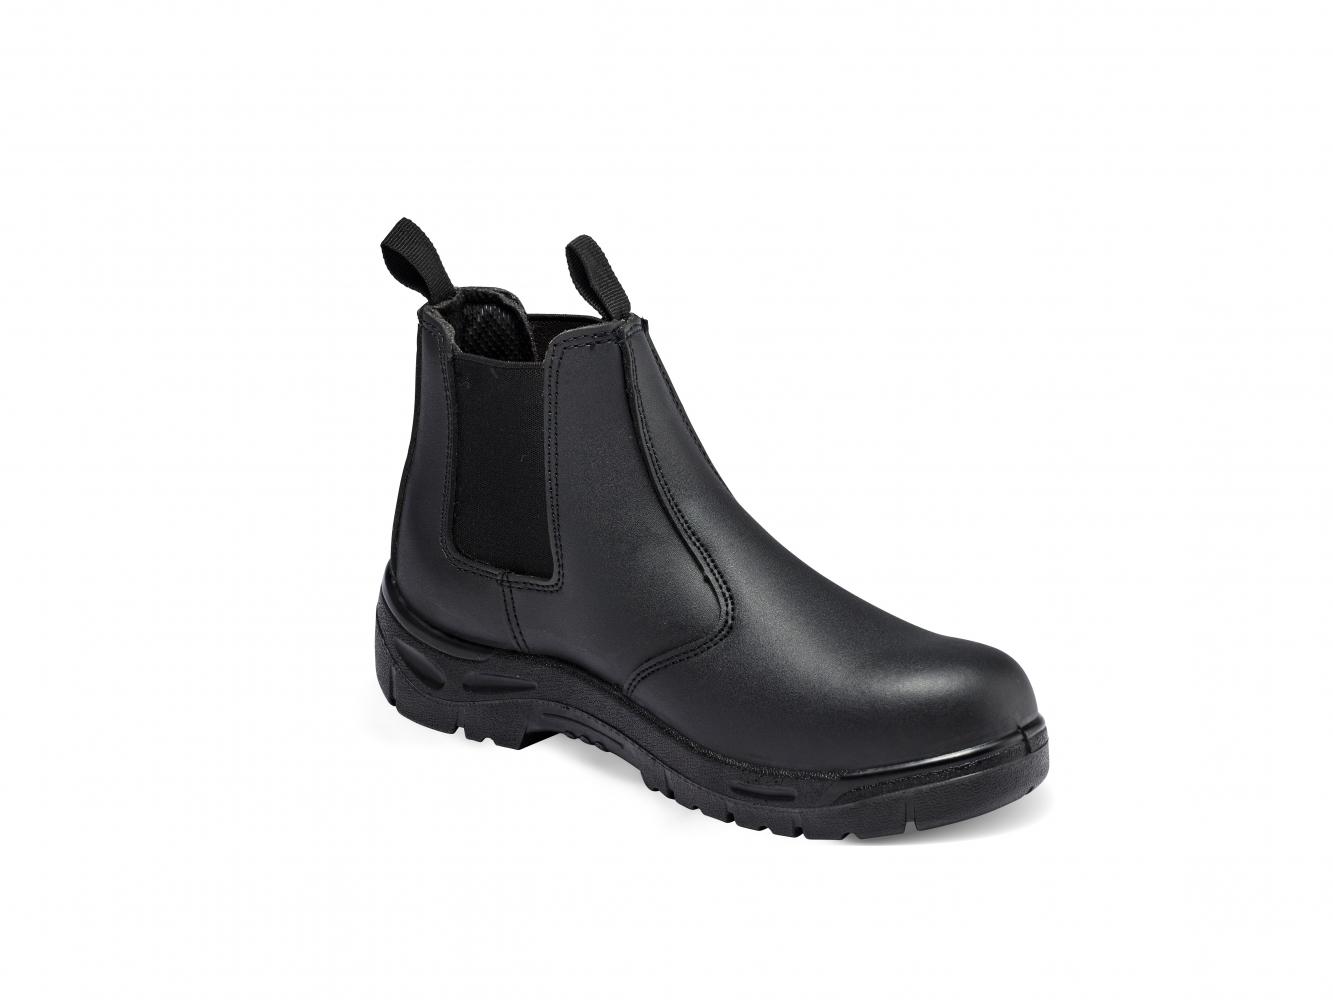 Titan Chelsea Safety Boot   Harvey Supplies